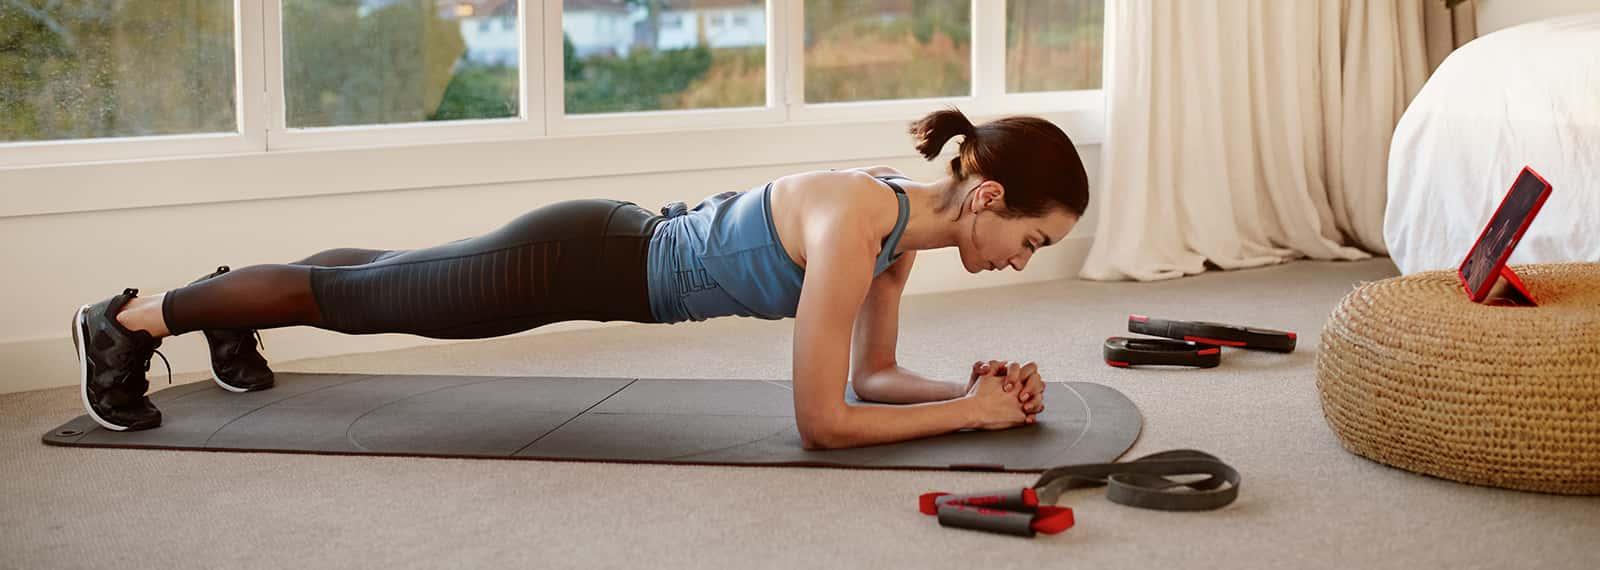 Fitnesskurse zu Hause no couchpotato